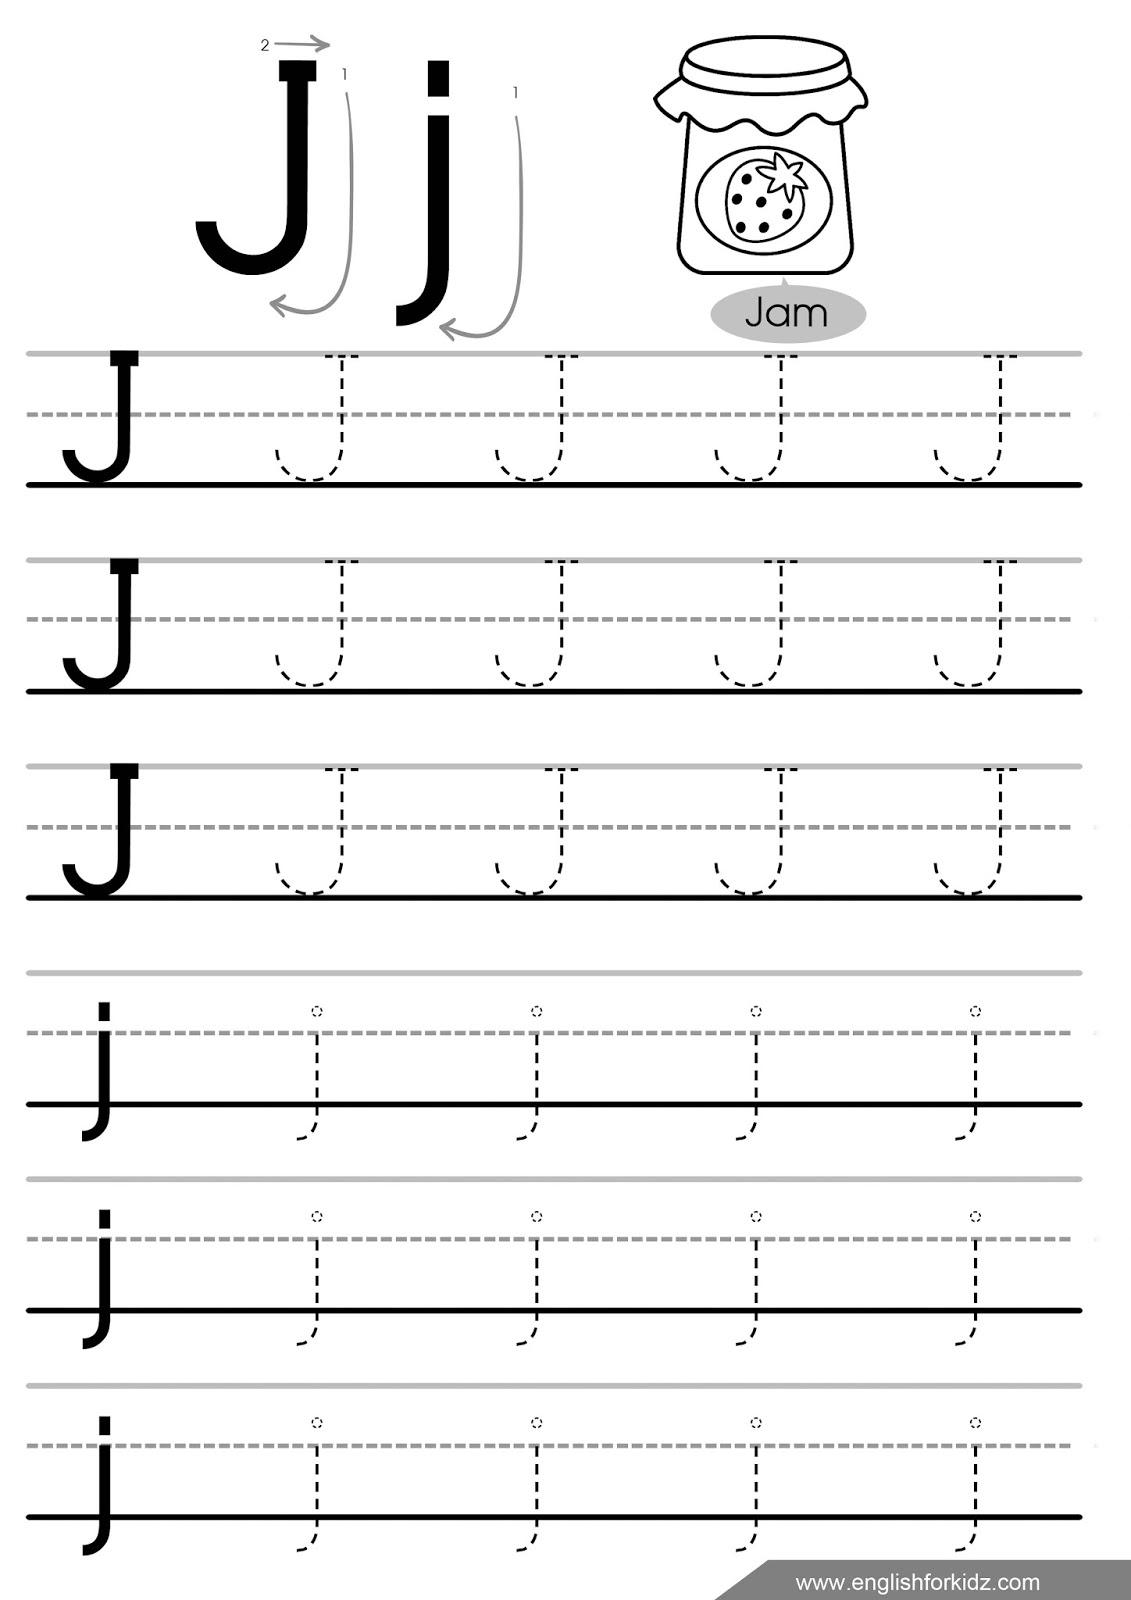 Letter Tracing Worksheets (Letters A - J) pertaining to Letter J Alphabet Worksheets